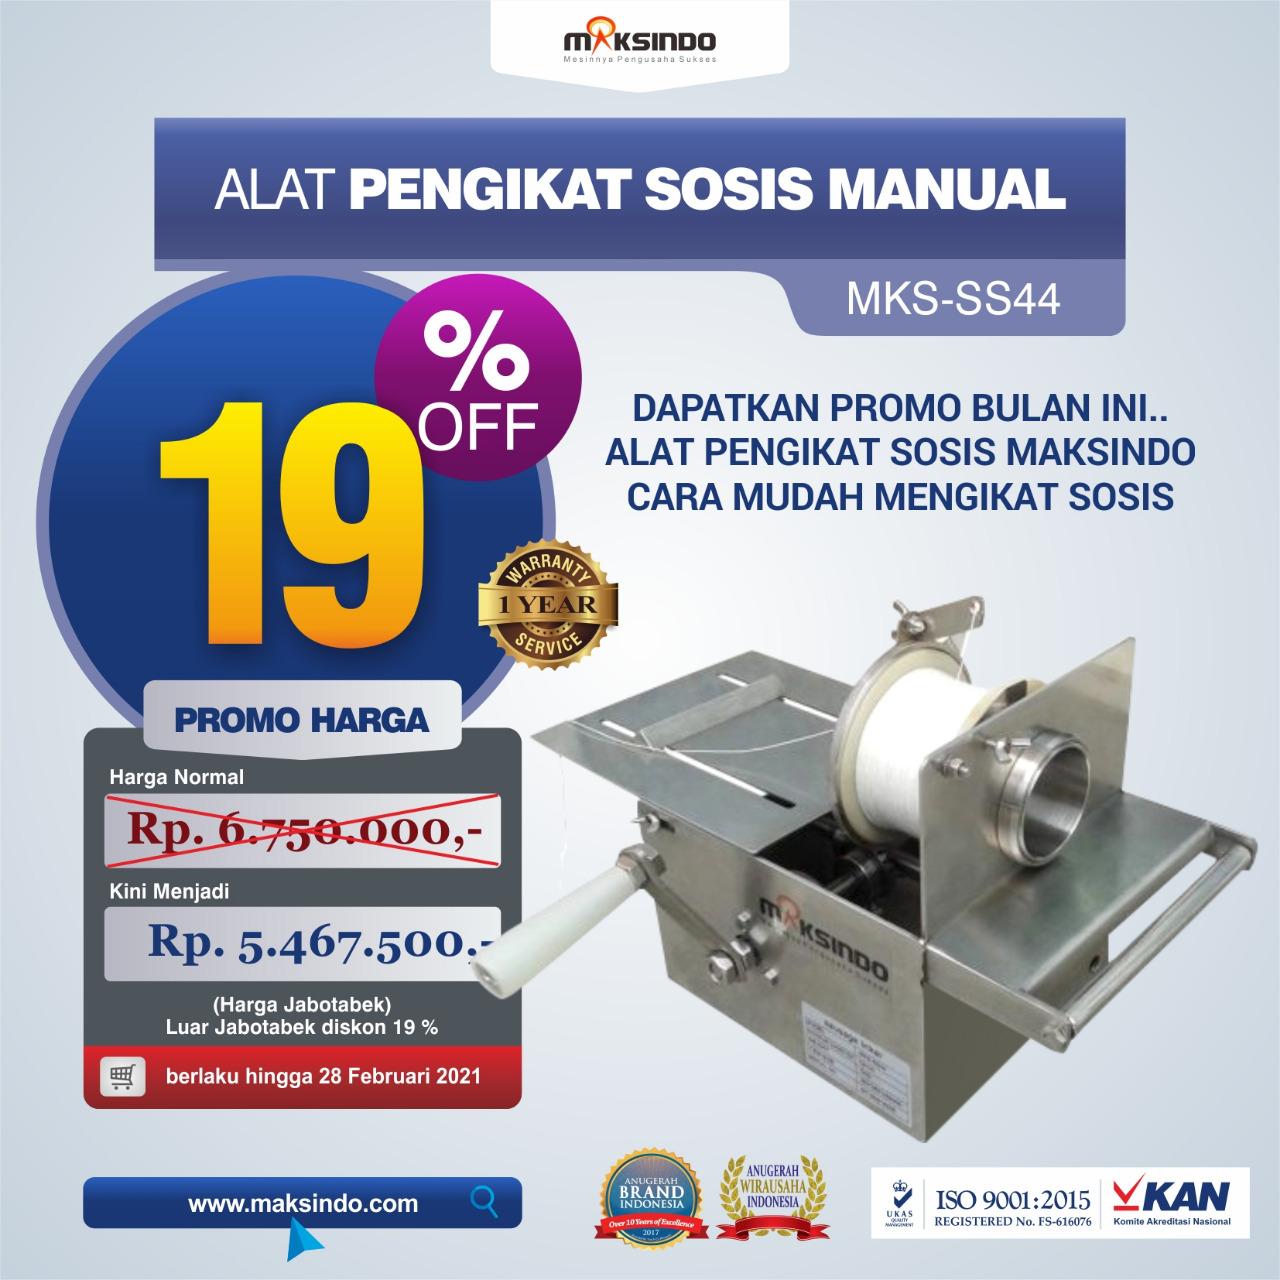 Jual Alat Pengikat Sosis Manual (MKS-SS44) di Medan